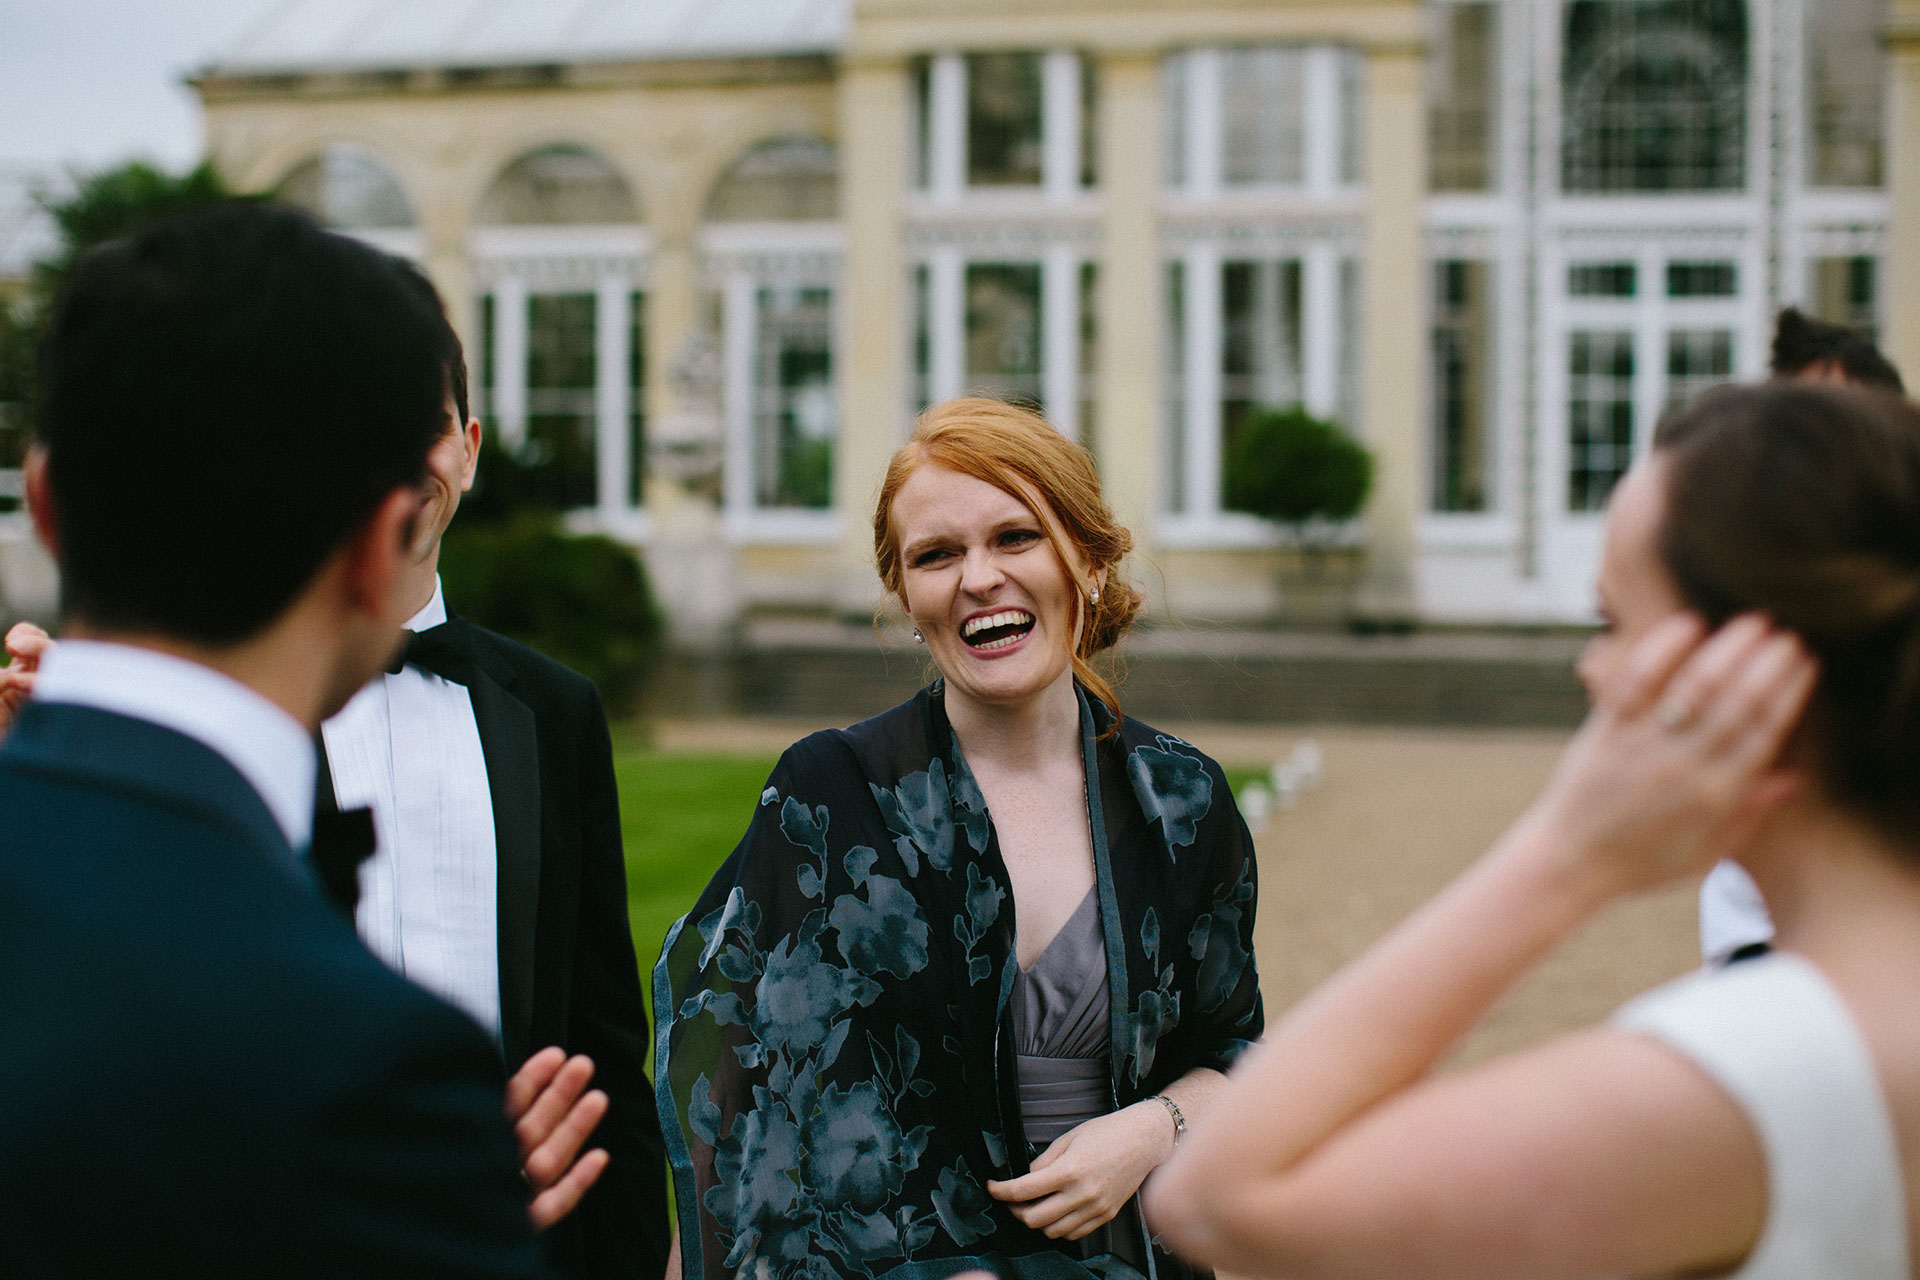 Syon-Park-Wedding-Photographer--_-Michael-Newington-Gray-412.jpg